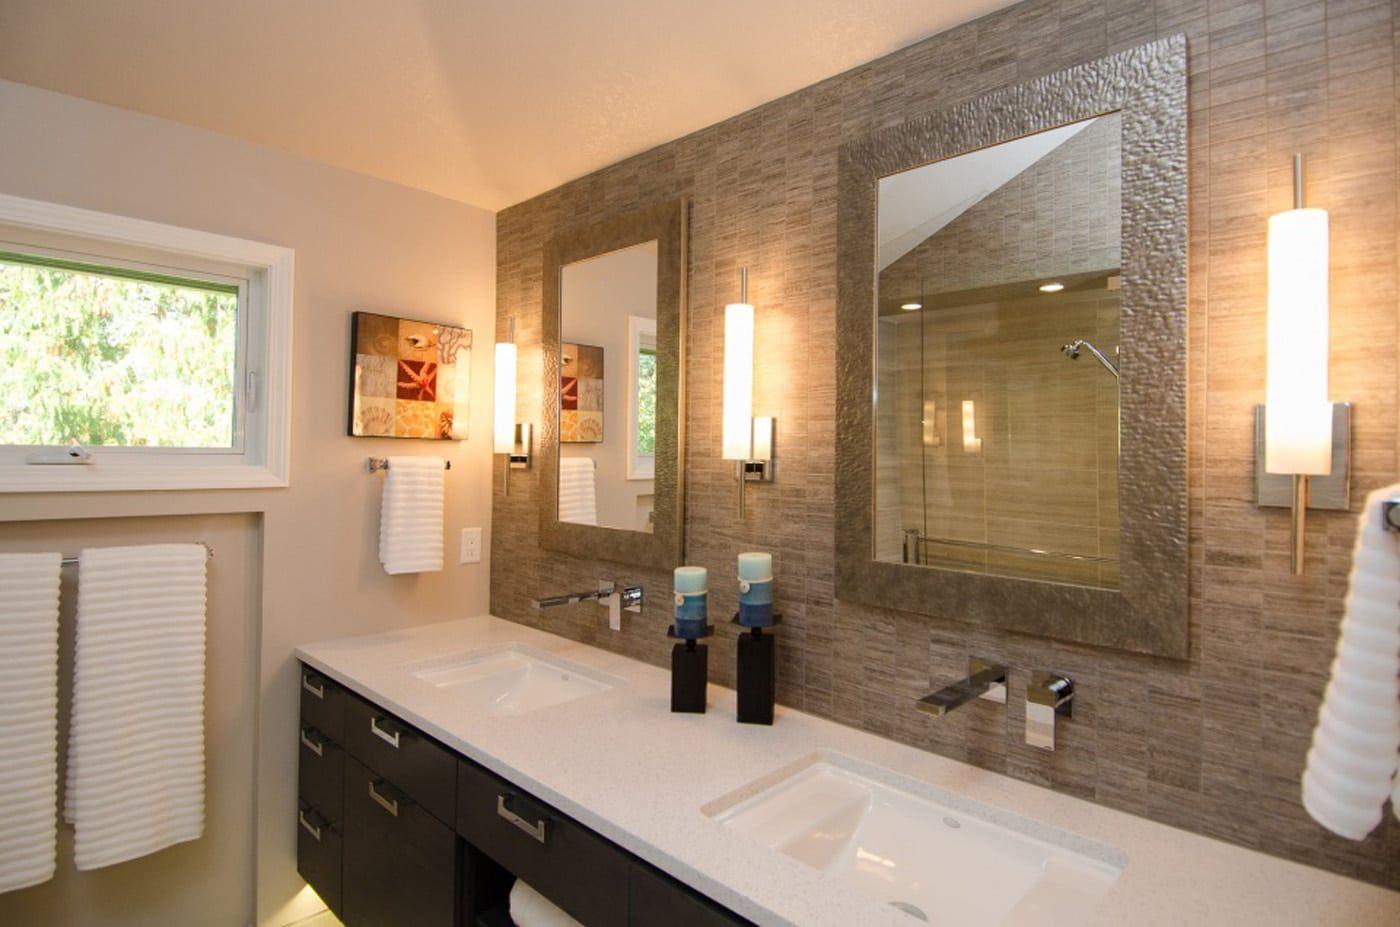 Amazing Modern Master Bathroom Design Ideas Blow Your Mind Bathroom Layout Modern Master Bathroom Design Master Bathroom Design